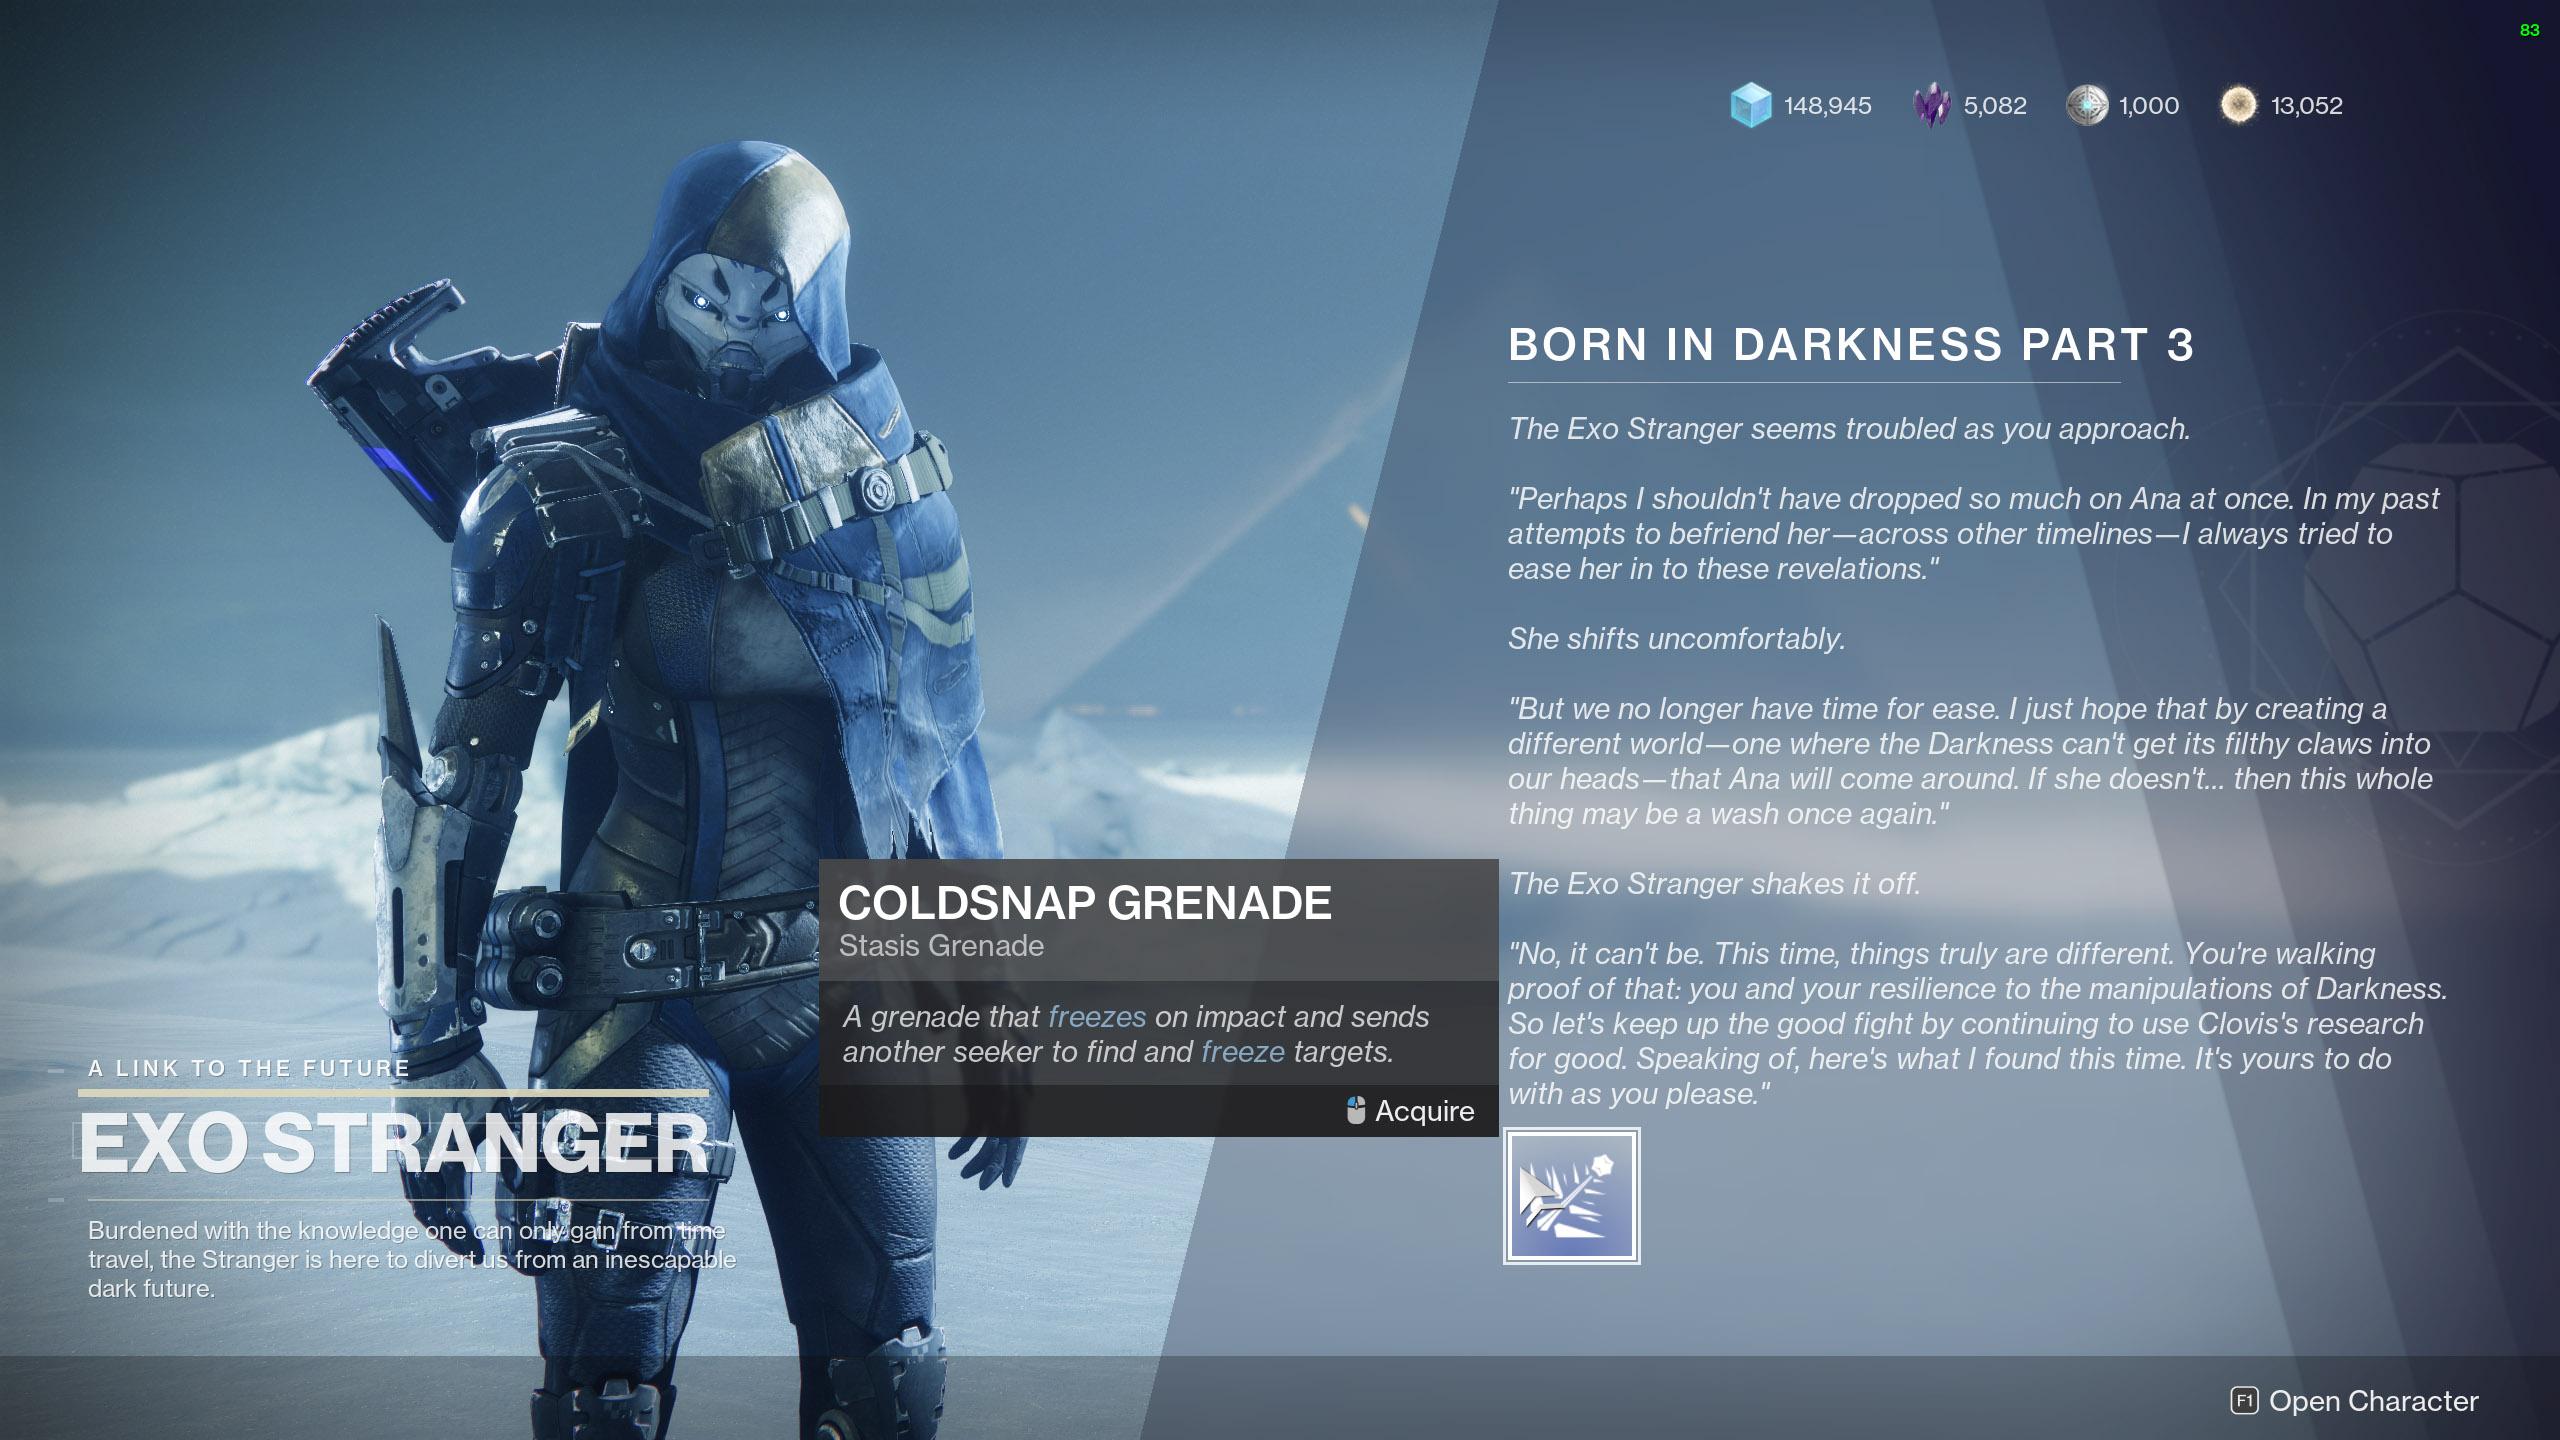 destiny 2 born in darkness coldsnap grenade